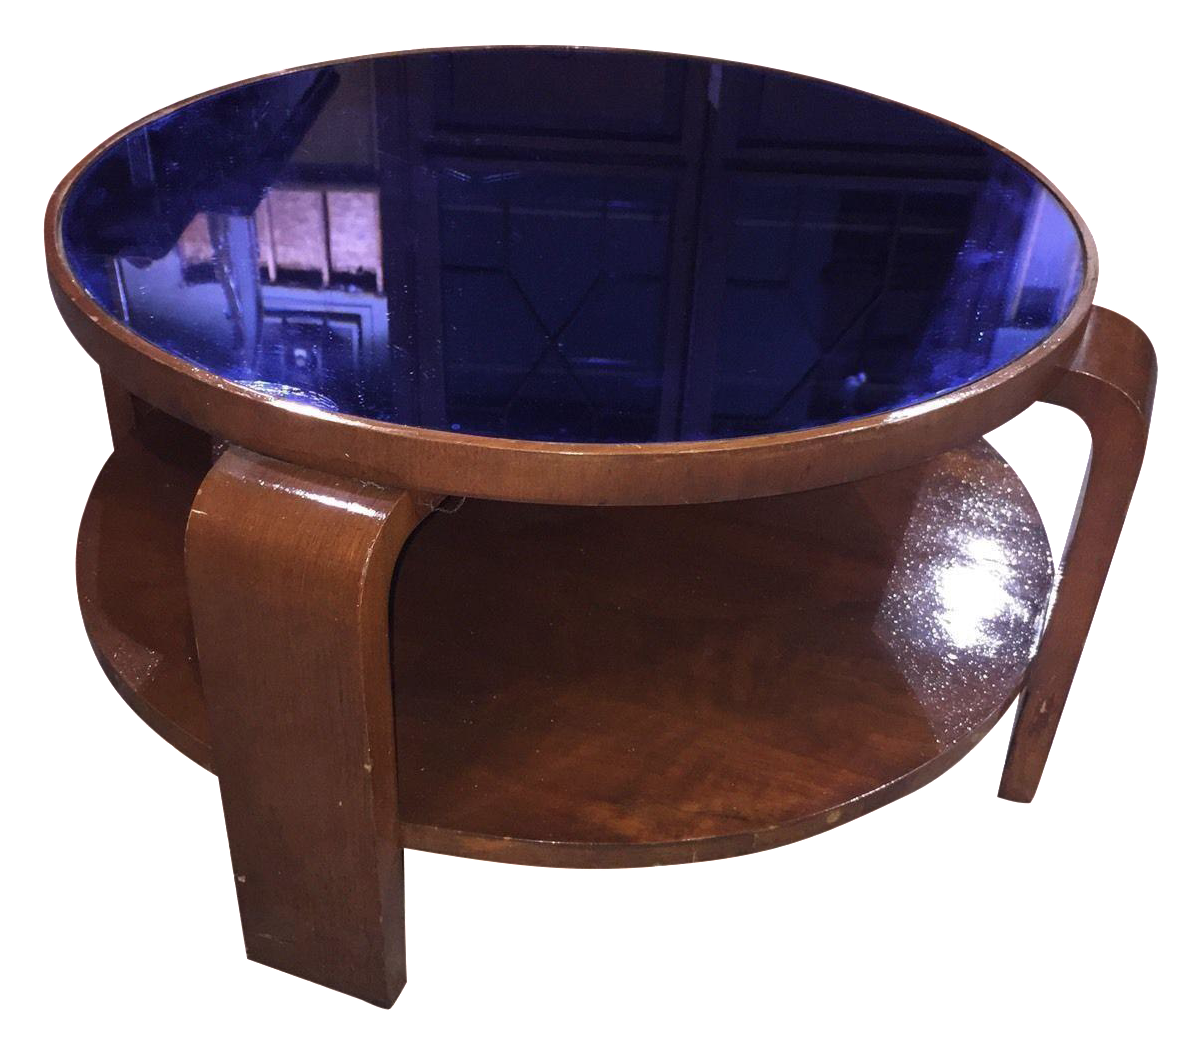 Captivating Round Mid Century Modern Table Featuring A Vivid Cobalt Blue Glass Top 15 1 4 H X 26 1 2 To Top X 30 1 Deco Decor Art Deco Lamps Art Deco Decor [ 1048 x 1200 Pixel ]